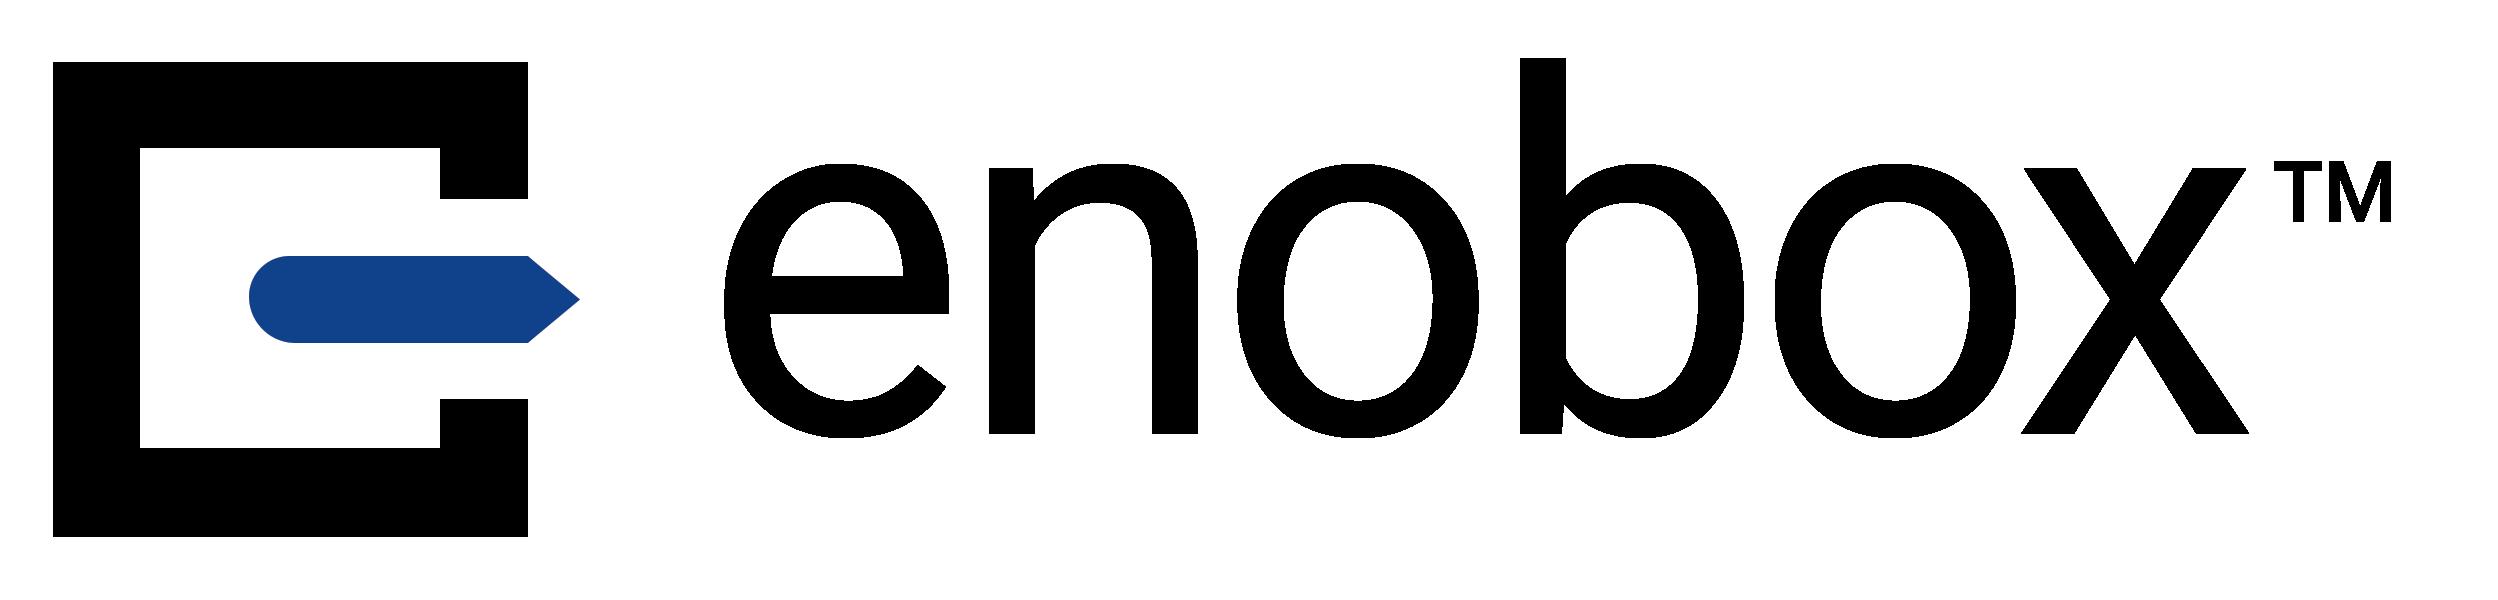 enobox (logo)